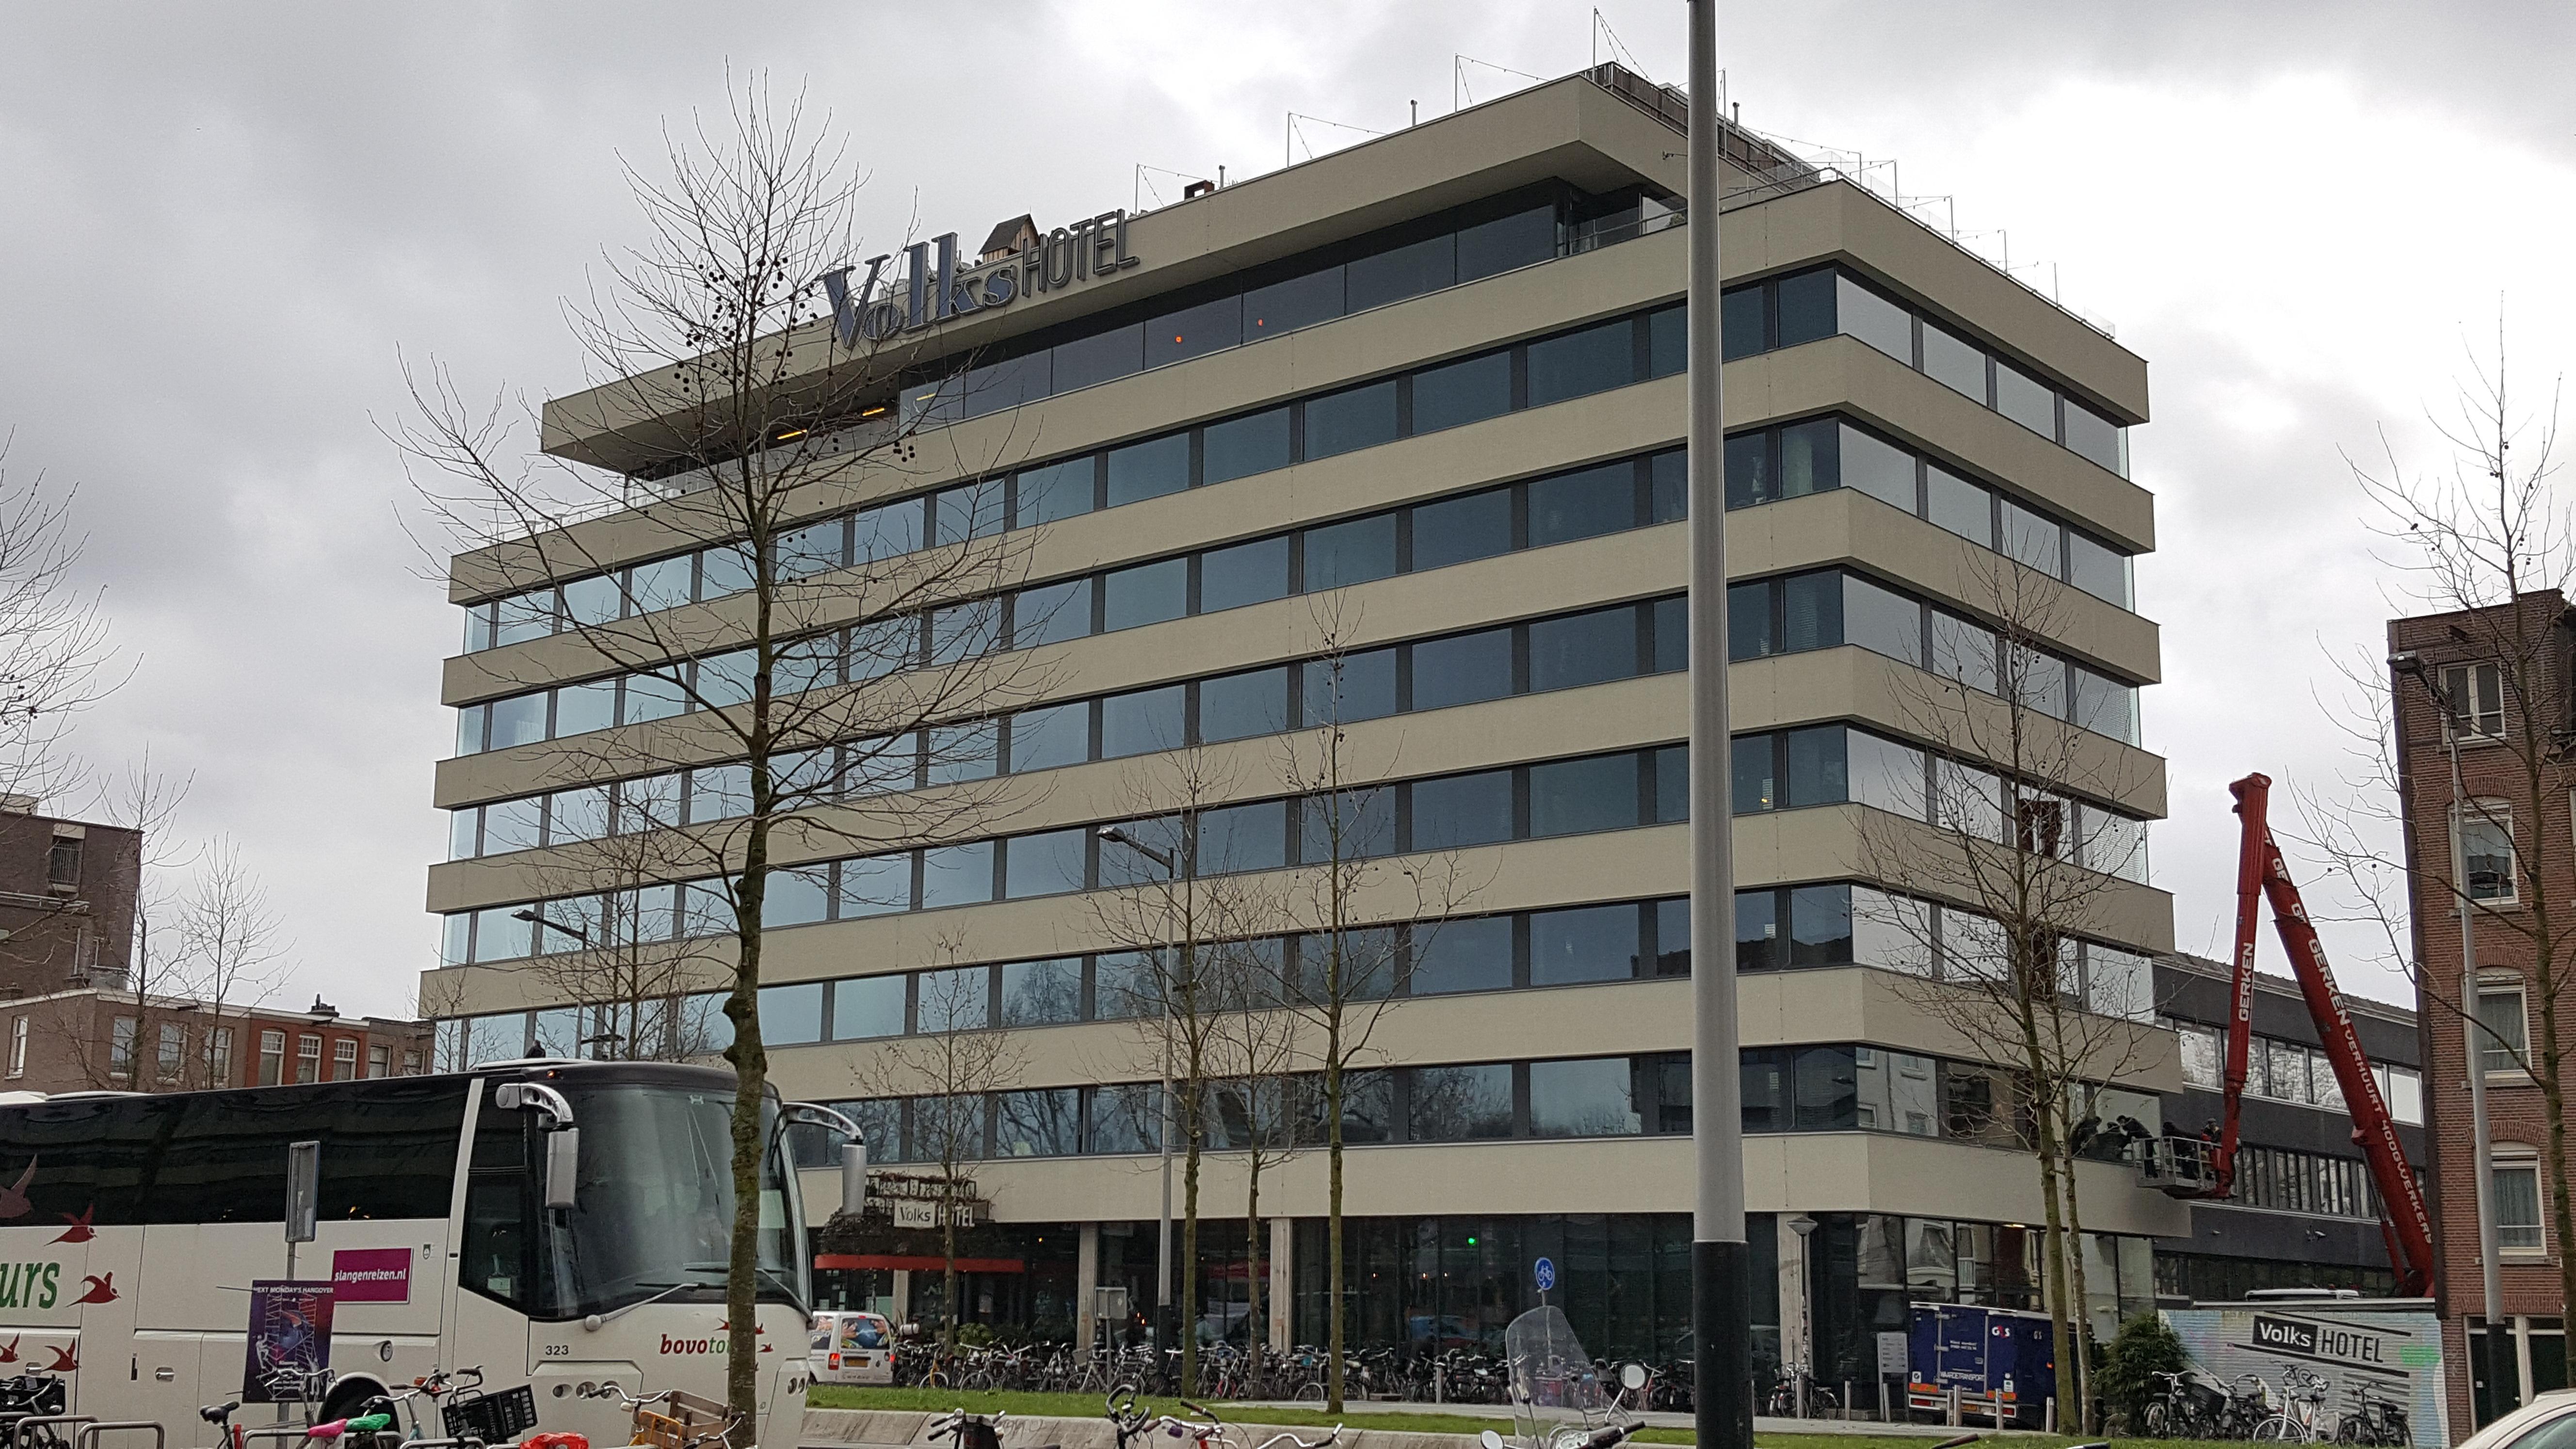 Volkshotel - Hotel in Amsterdam